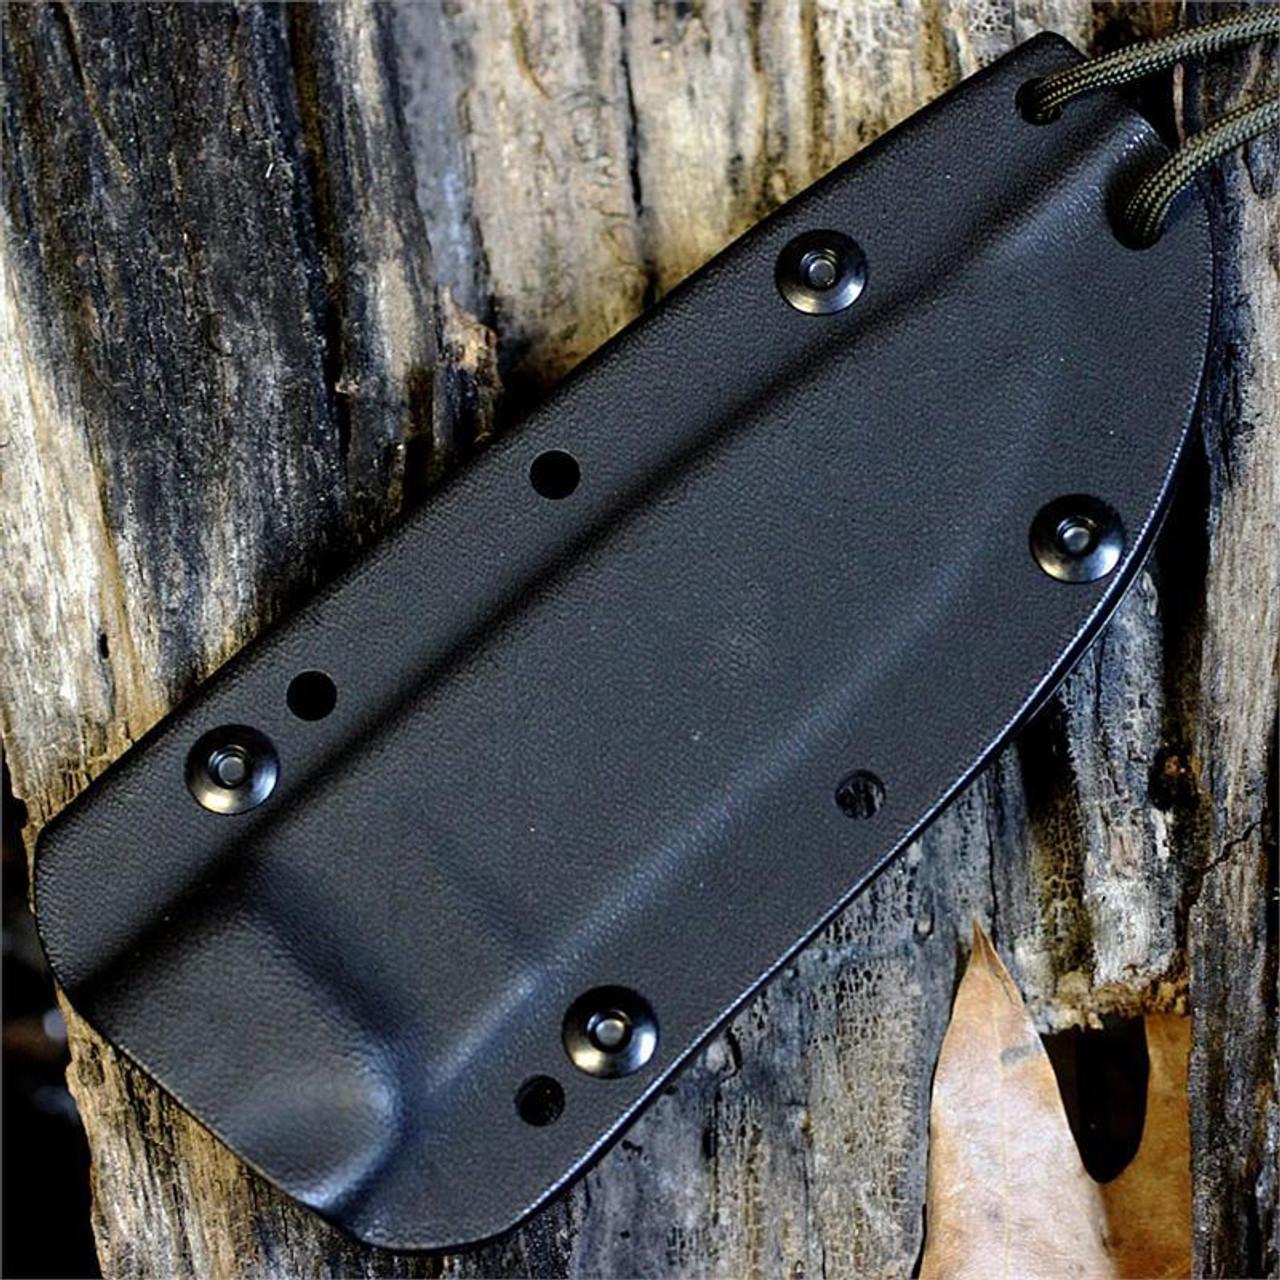 *ESEE Model 4SK, Black Kydex Sheath With Clip Plate, Combo Edge No Box